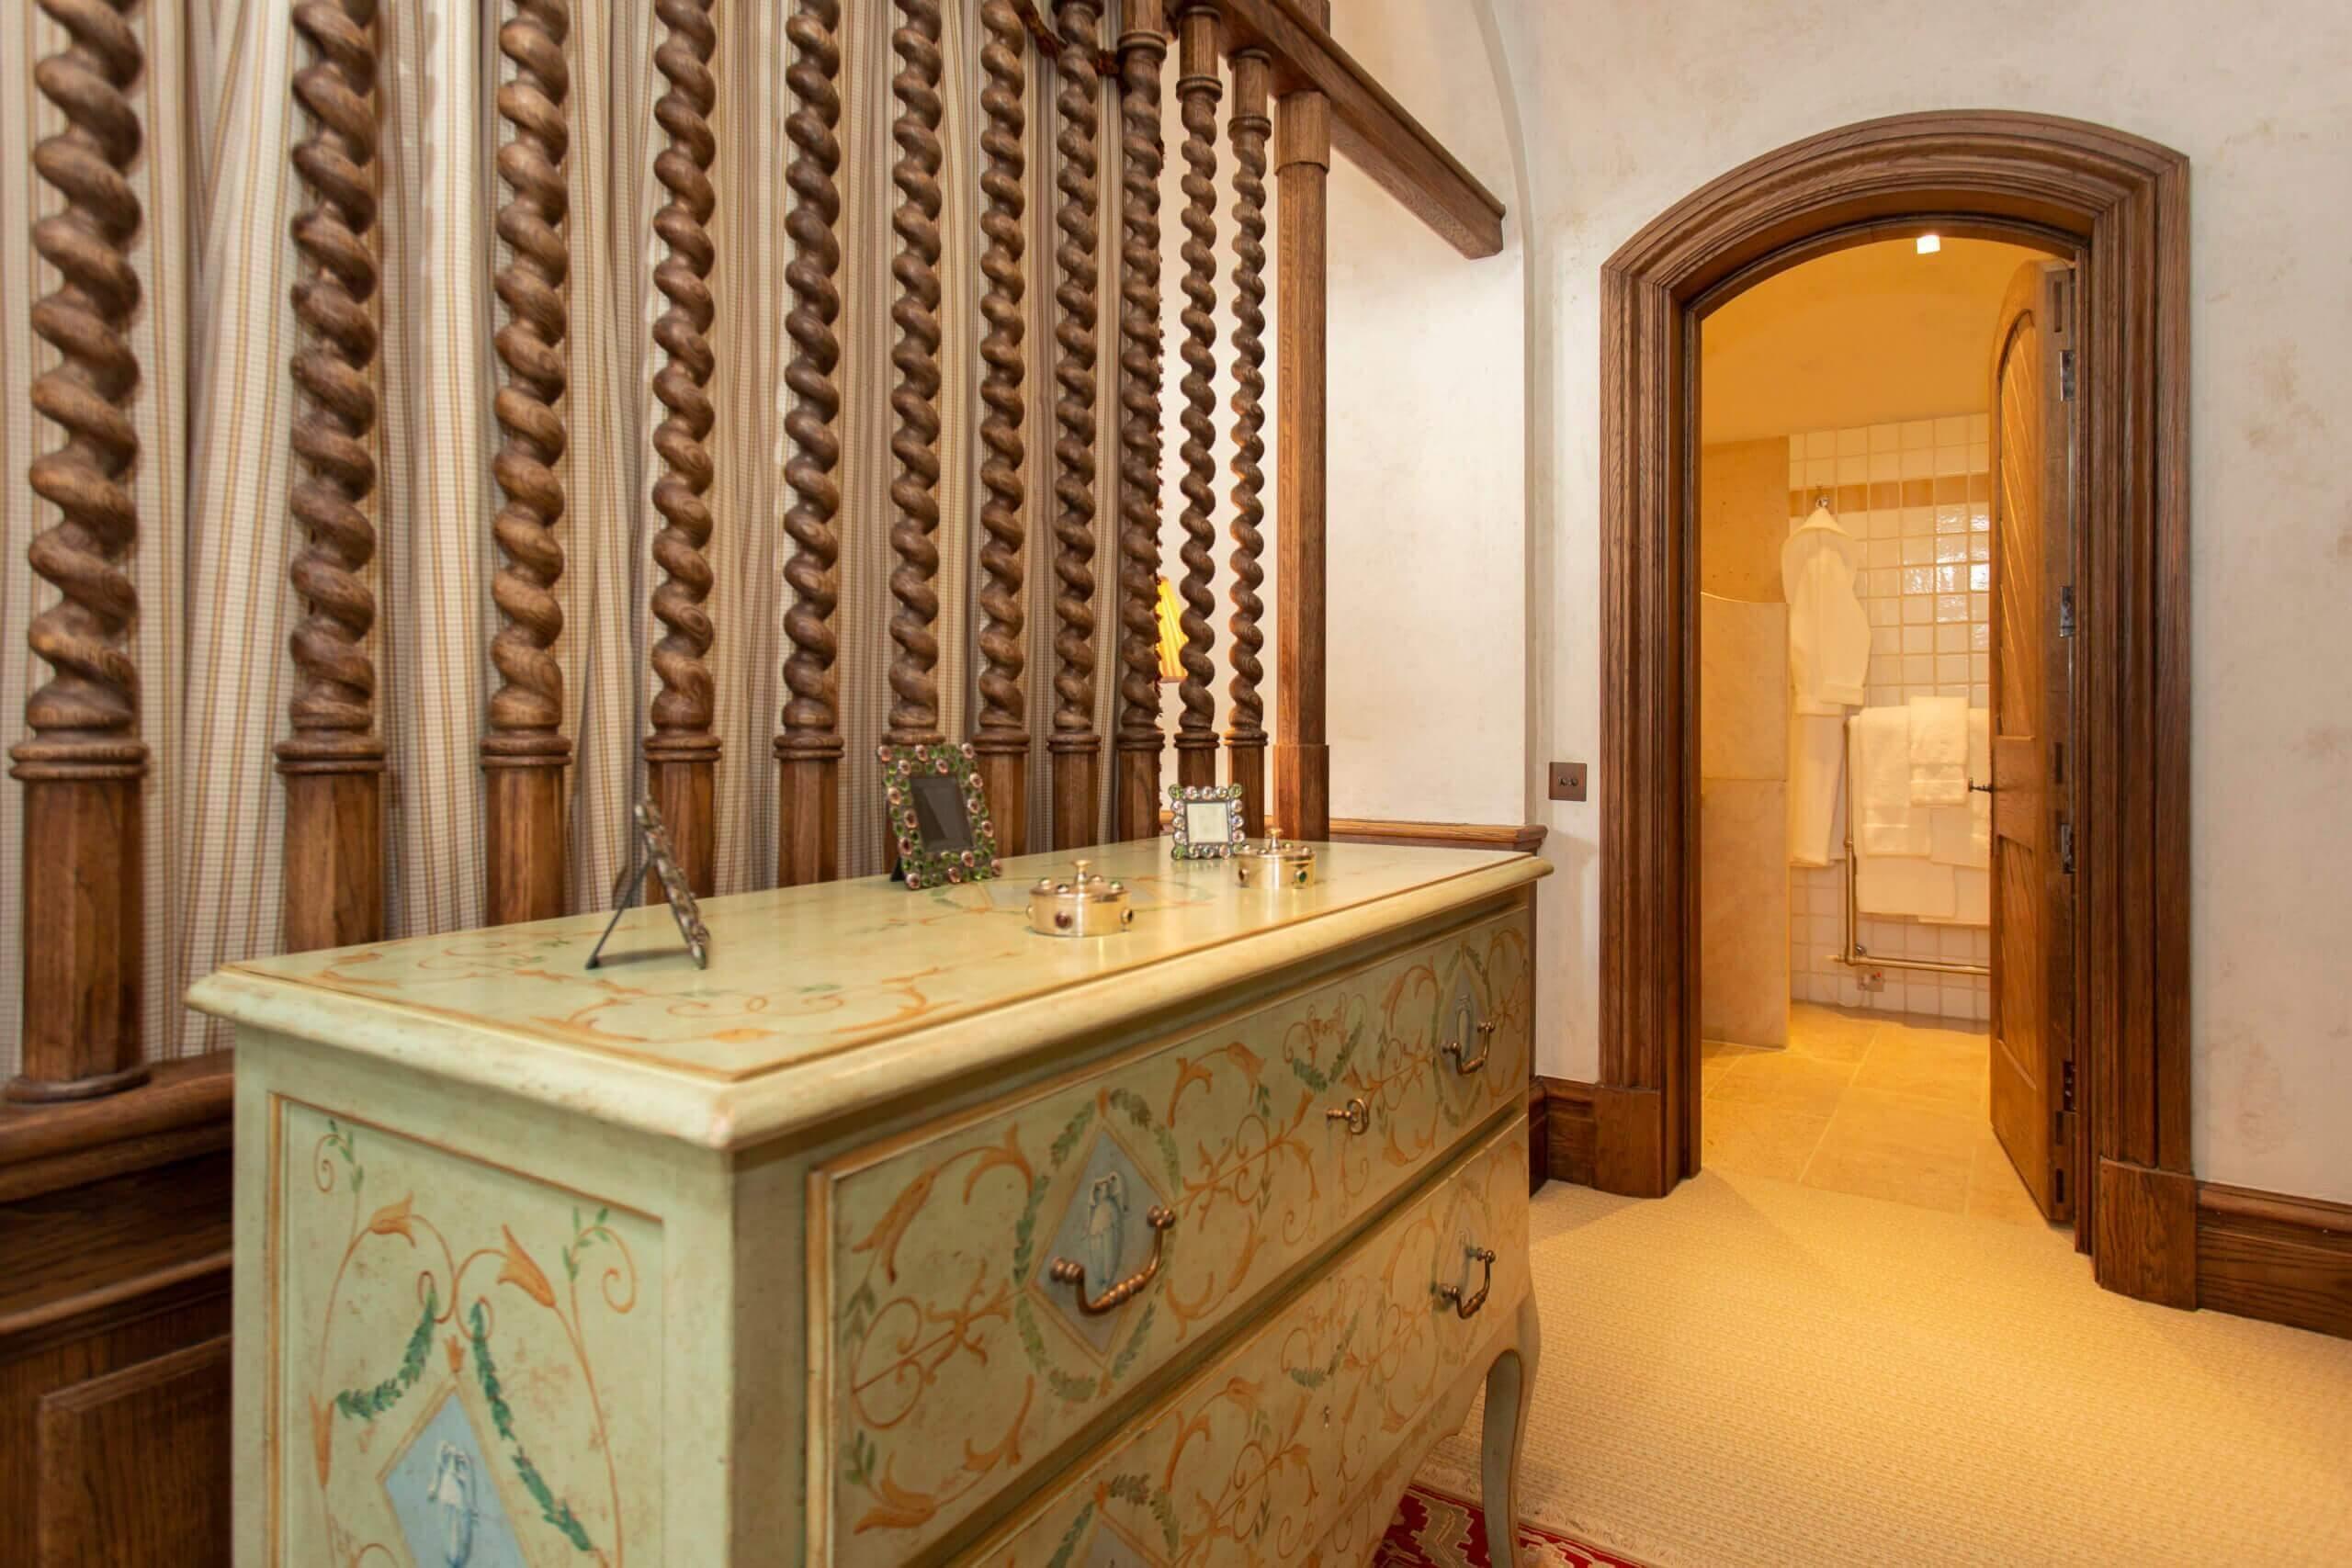 Gate Lodge bespoke furniture designer inspired interiorss